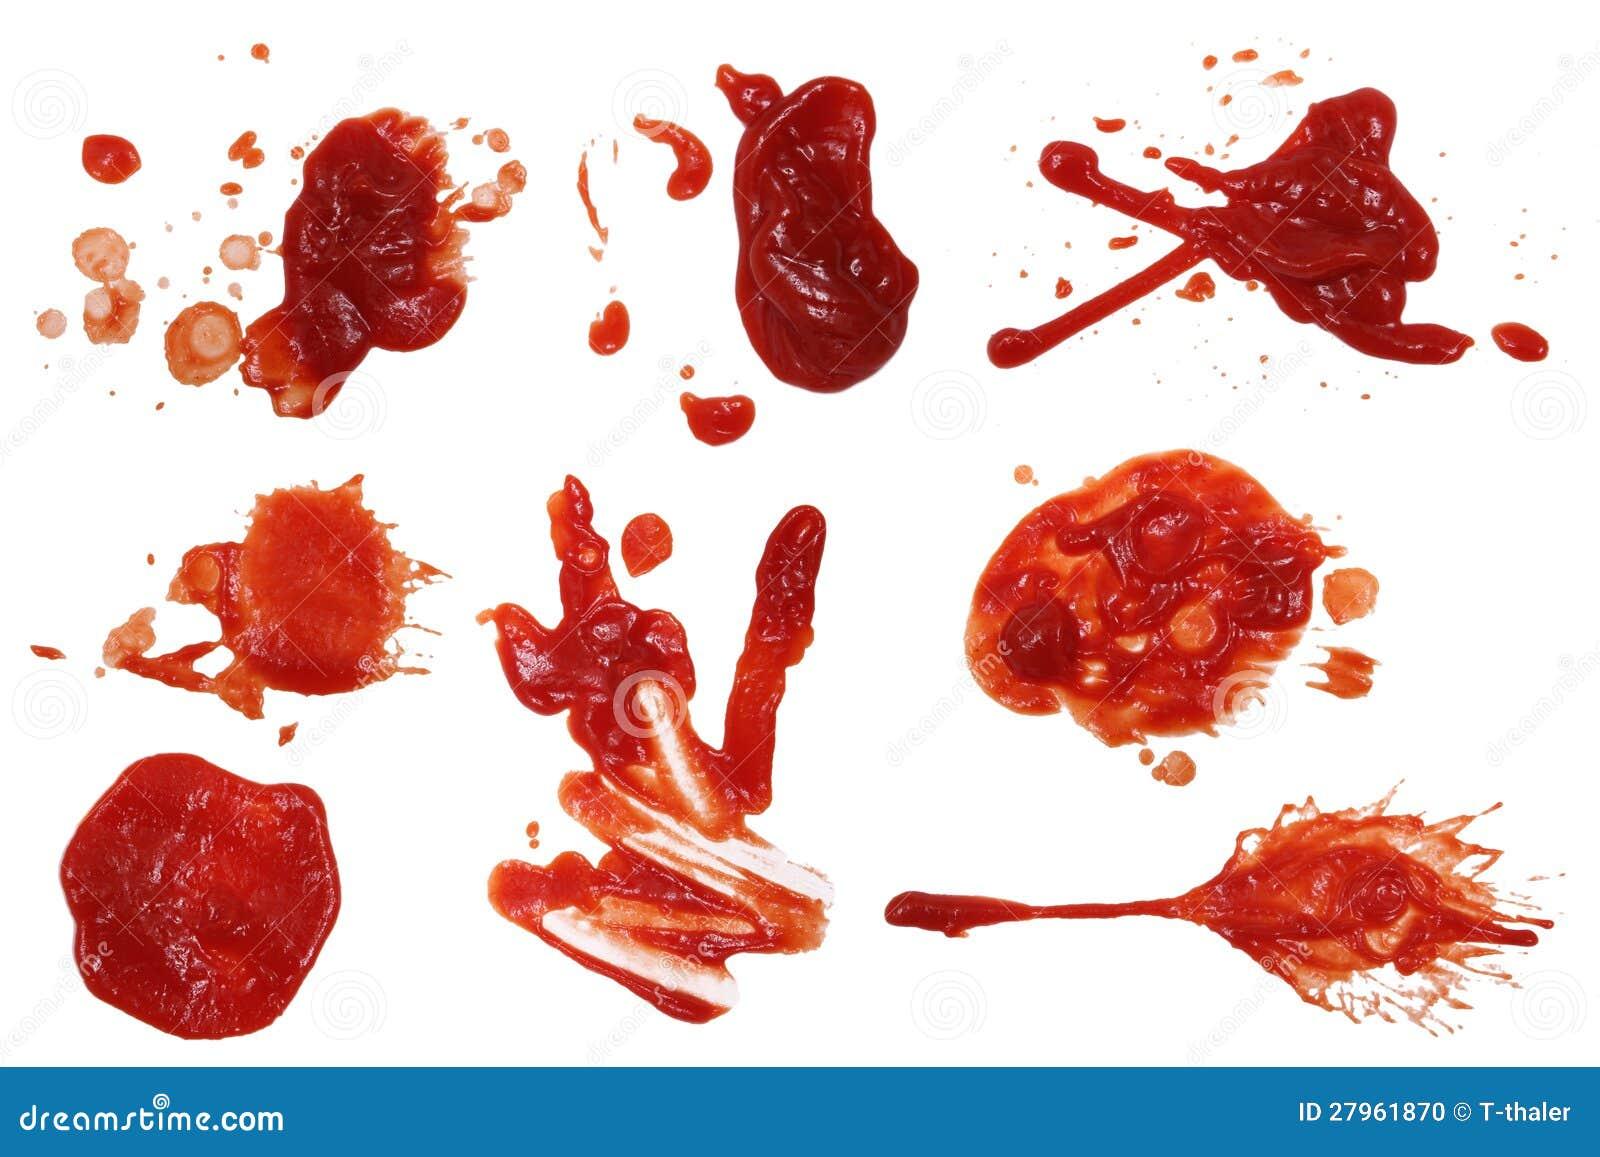 ketchup stain 5 stock photo image of serving splashes 27961870. Black Bedroom Furniture Sets. Home Design Ideas